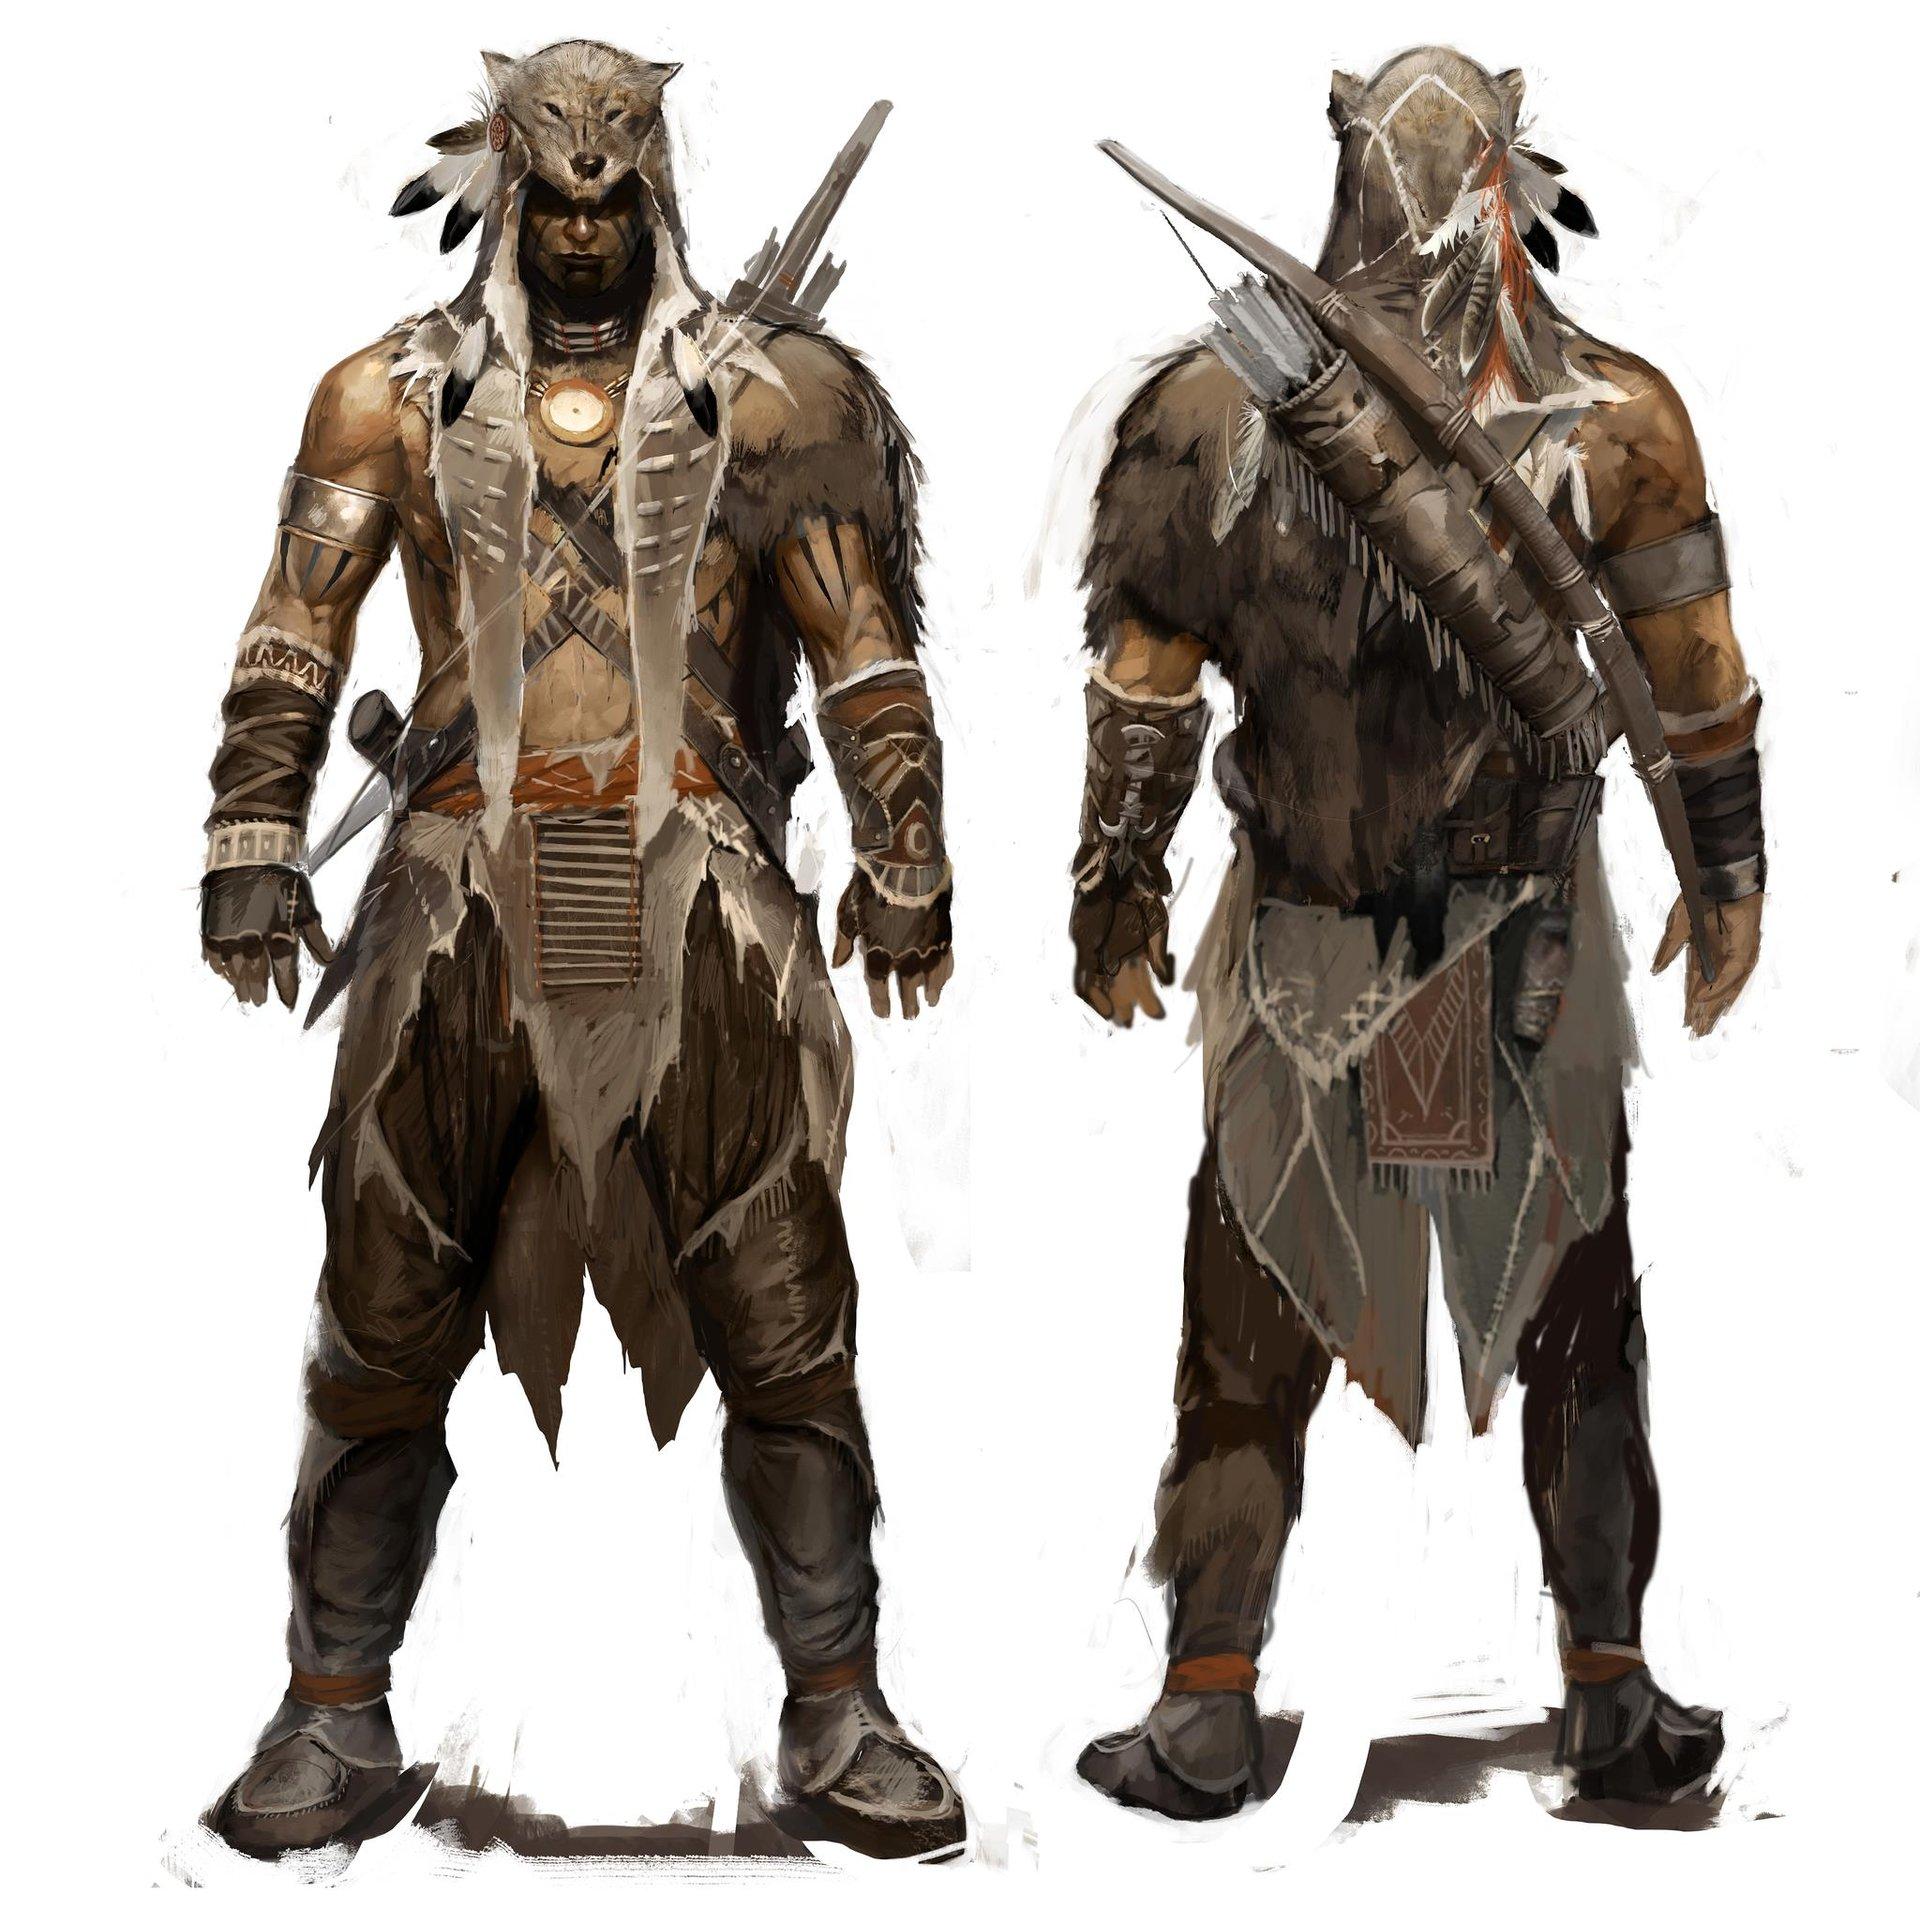 Artstation Assassin S Creed 3 Dlc Concept Art Guillaume Menuel